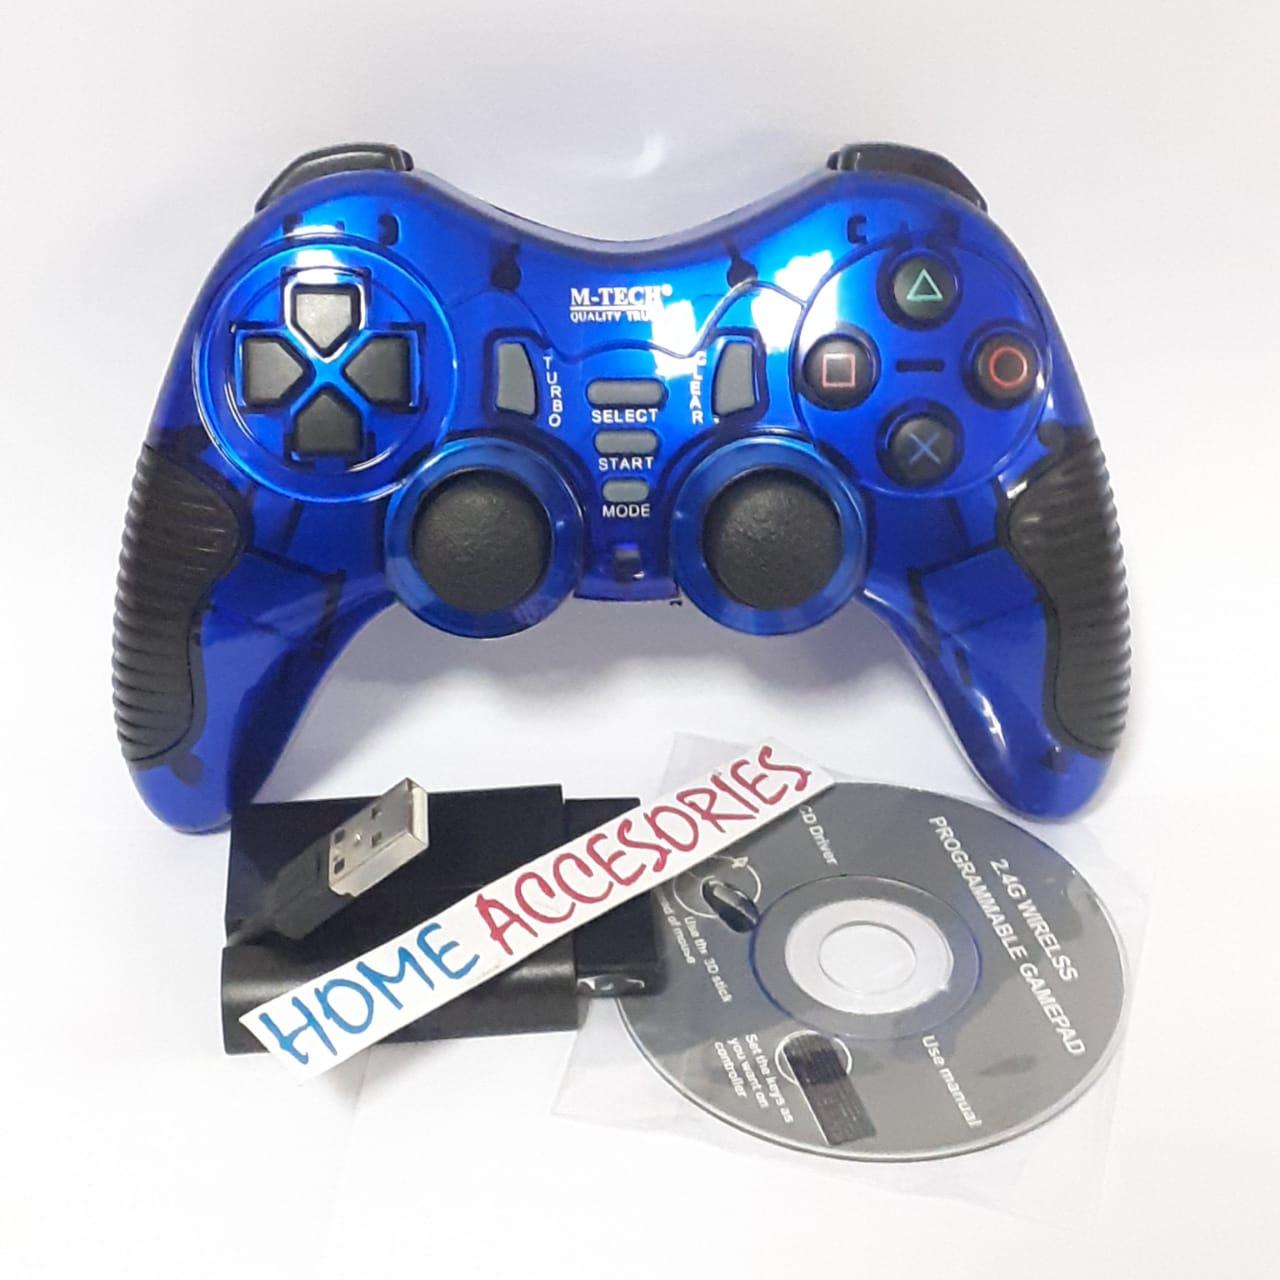 https://www.lazada.co.id/products/stickstik-ps2ps3-wireless-single-turbo-stick-ps-stick-pc-joystick-single-wireless-turbo-gamepad-usb-joypad-stik-ps-gamepad-i1075990847-s1676496751.html